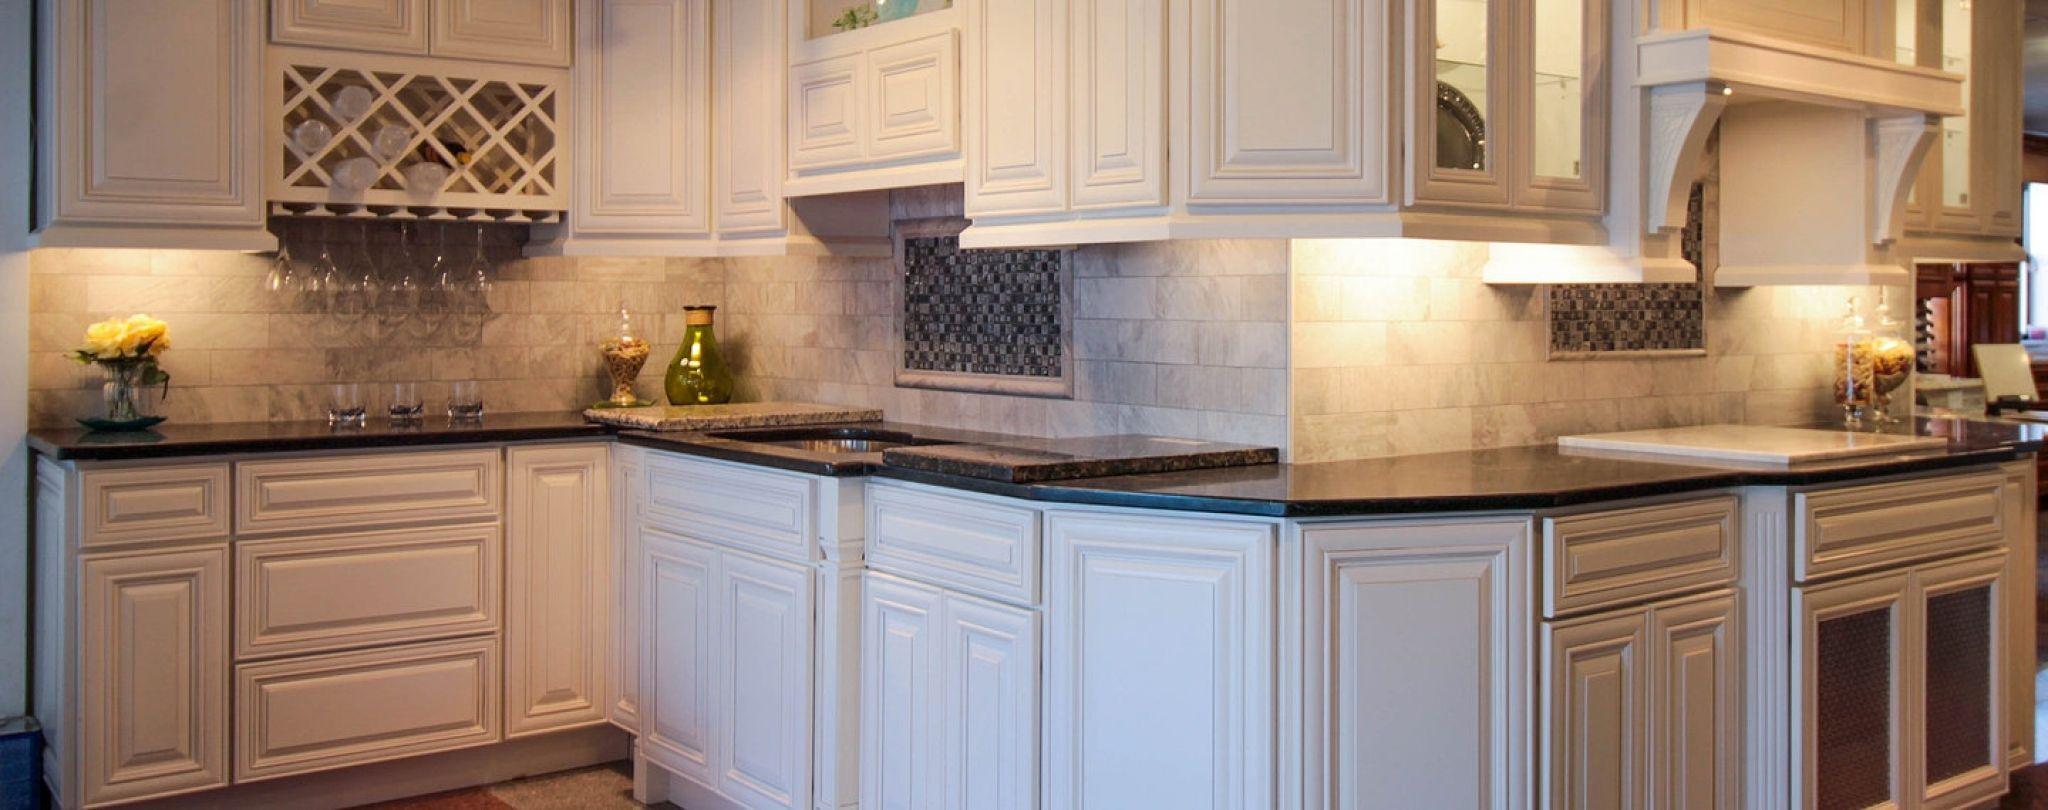 Best Quality Kitchen Cabinets on quality bedroom sets, quality kitchen curtains, quality kitchen sinks, quality kitchen furniture, quality kitchen lighting, doors cabinets, quality kitchen design, quality kitchen utensils,